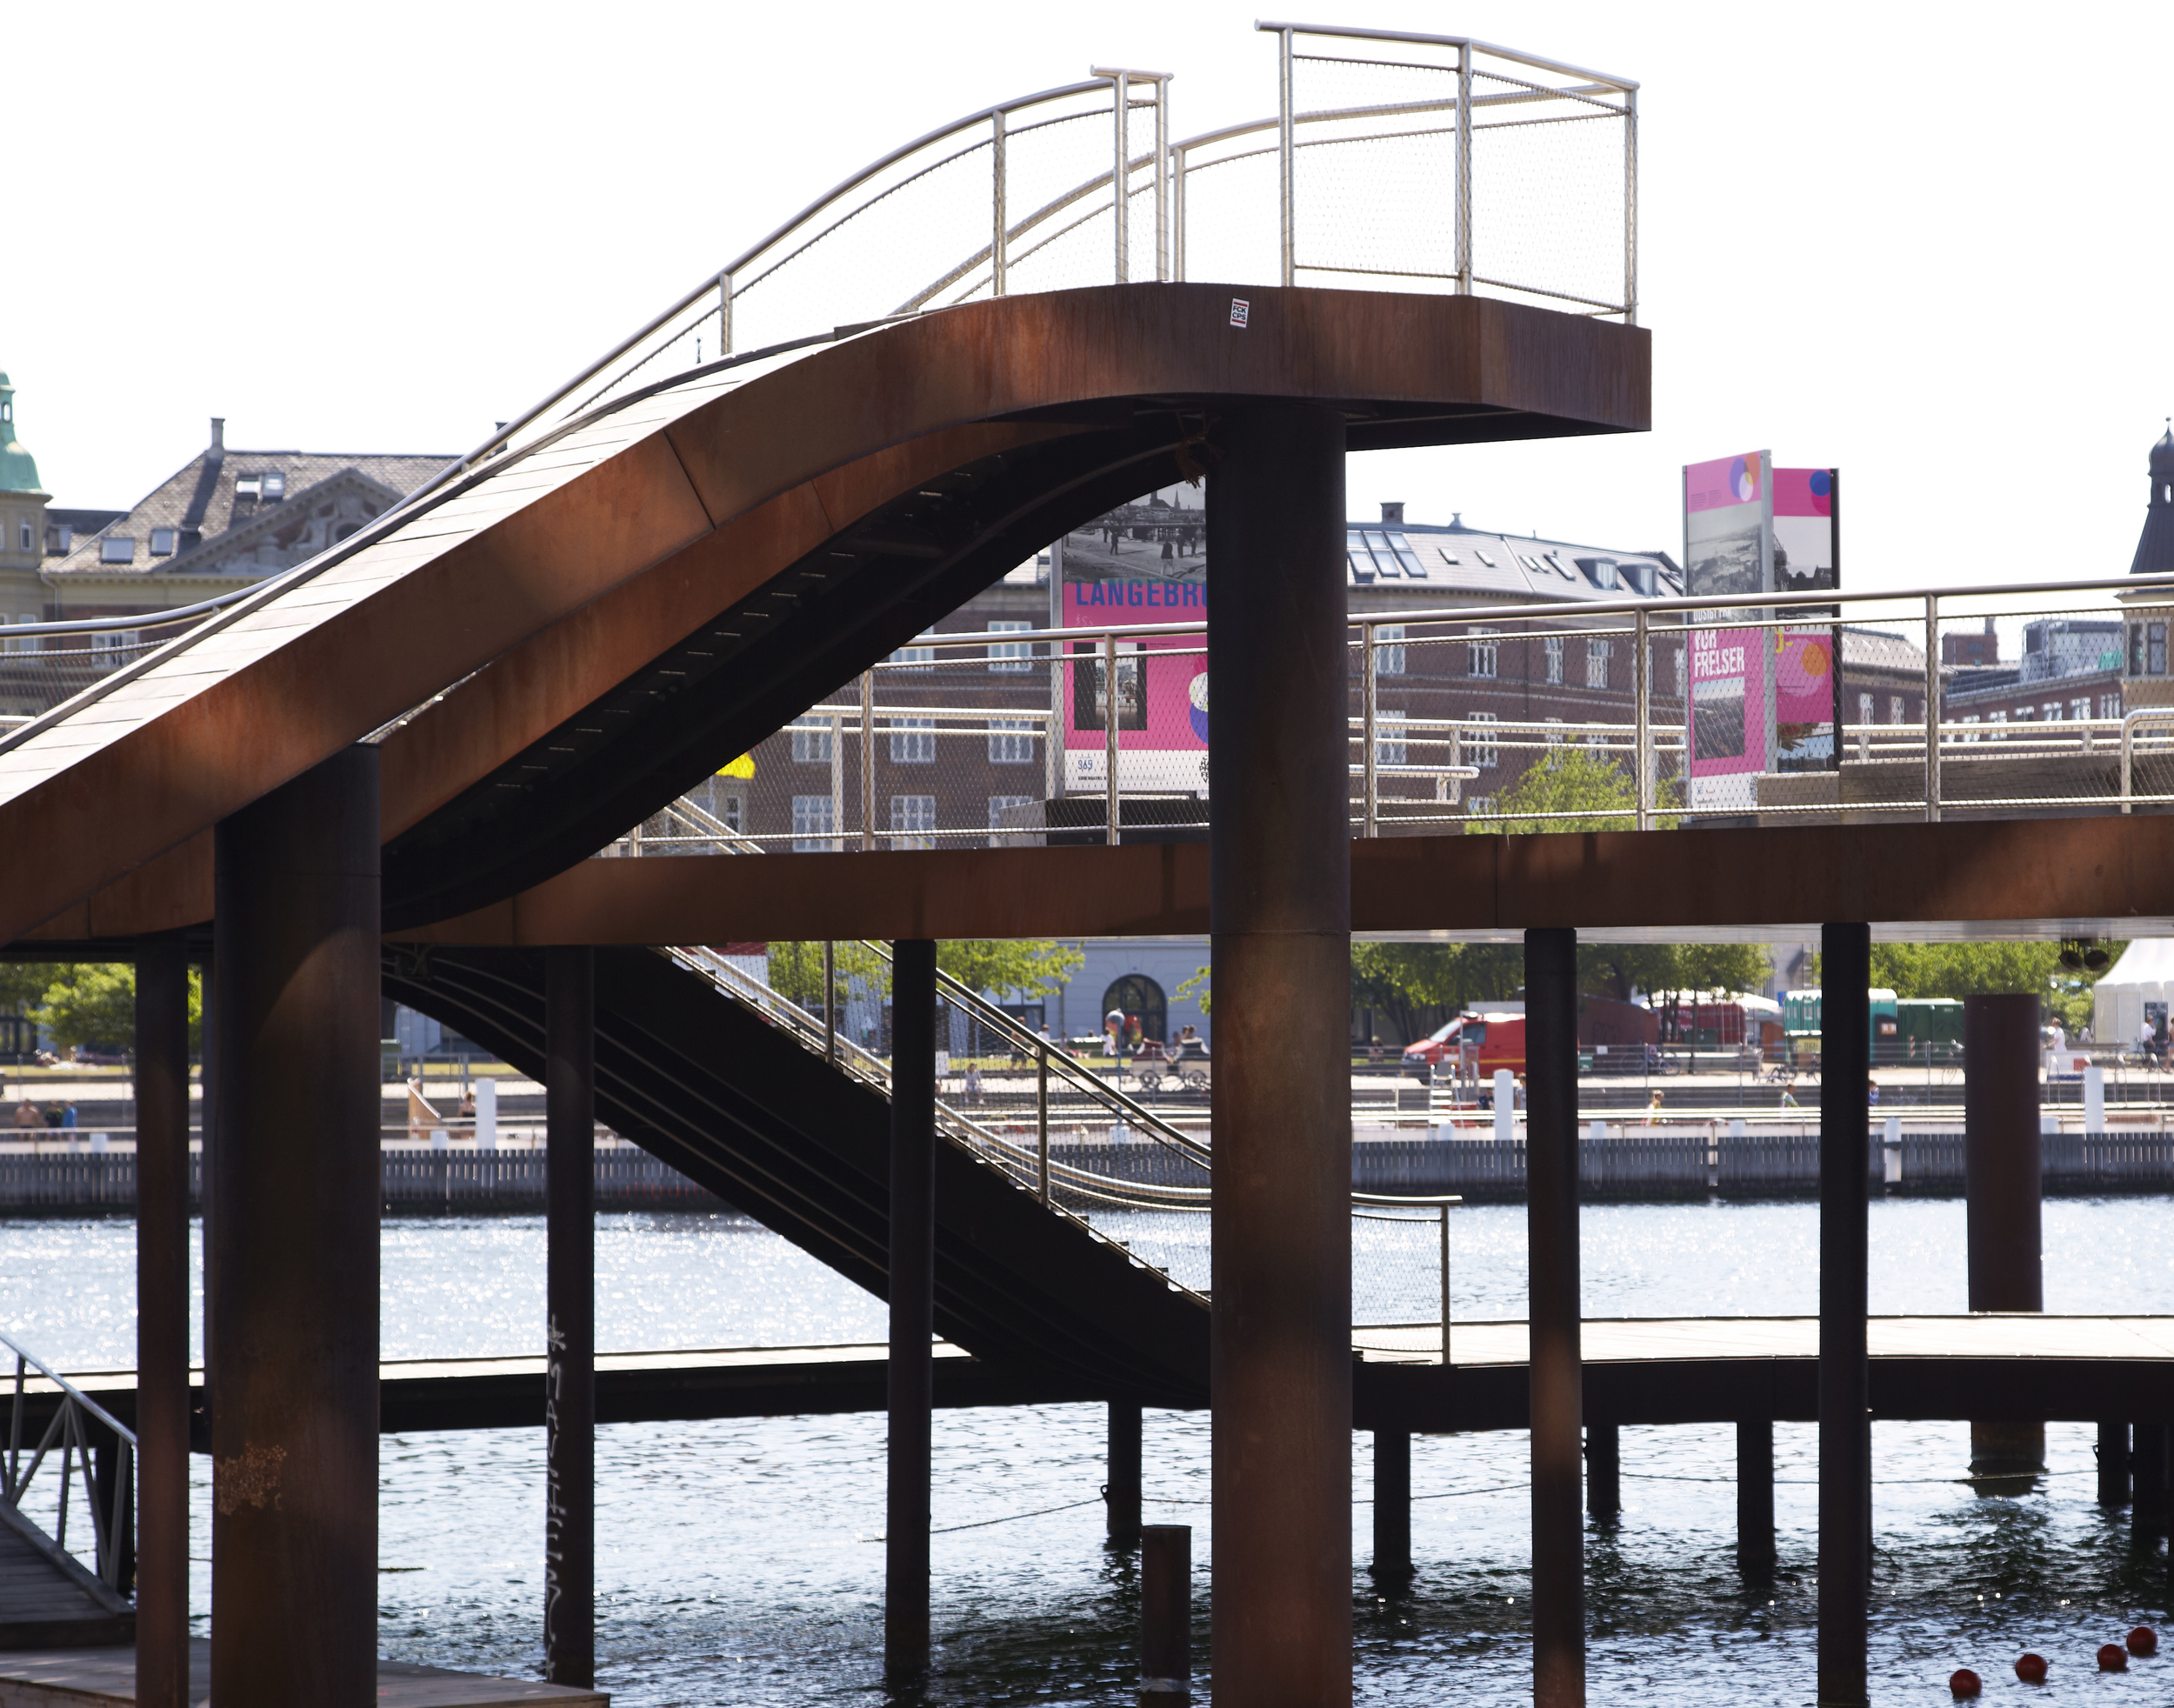 harbourbaths1.jpg